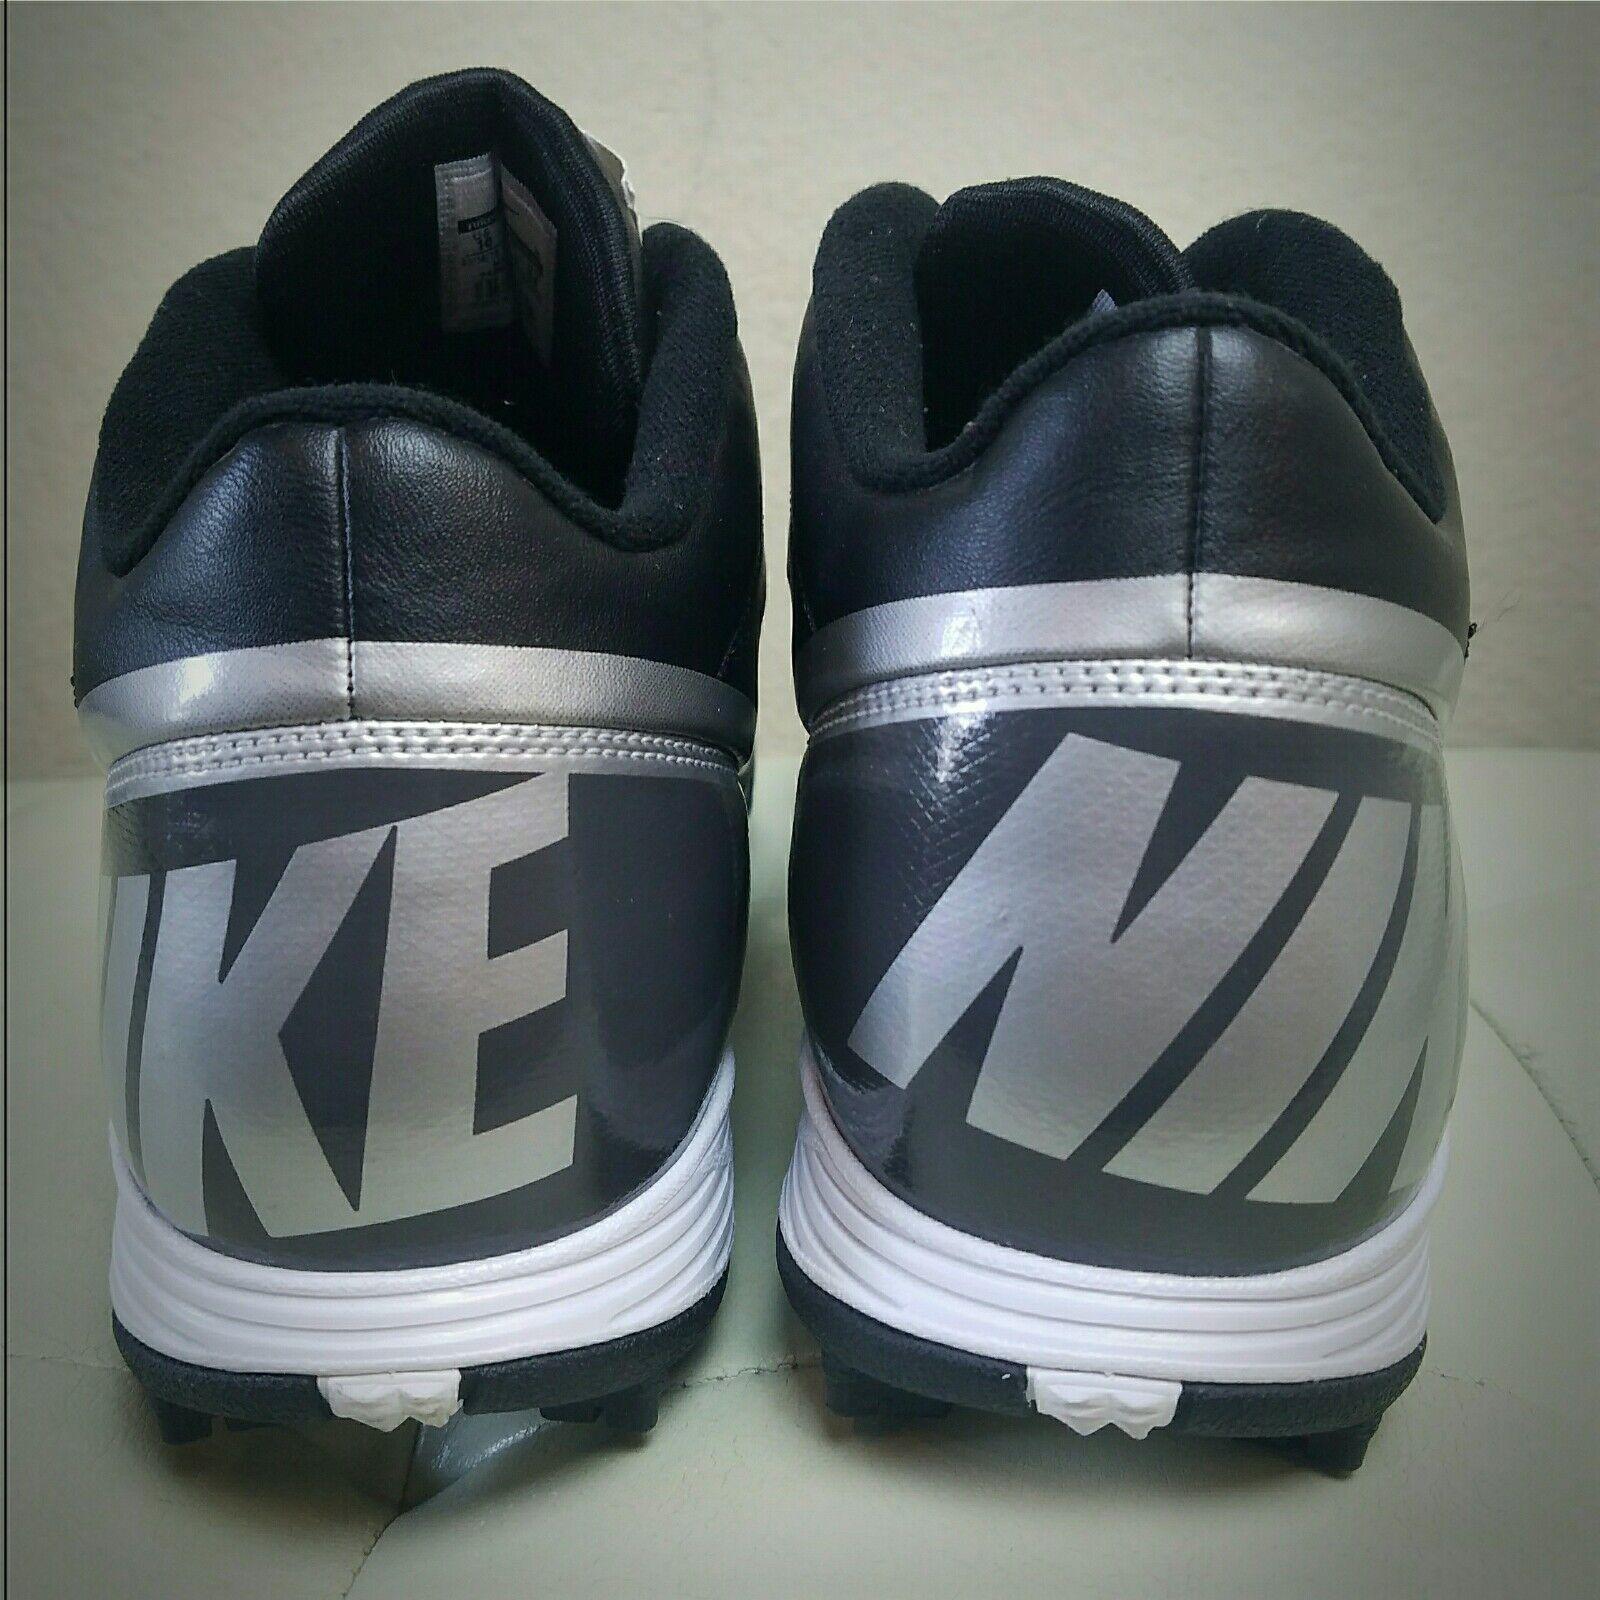 buy online 357af b8f98 ... Nike Land Shark 3 3 3   4 Negro Plata tornado Football cleats  511292-009 ...